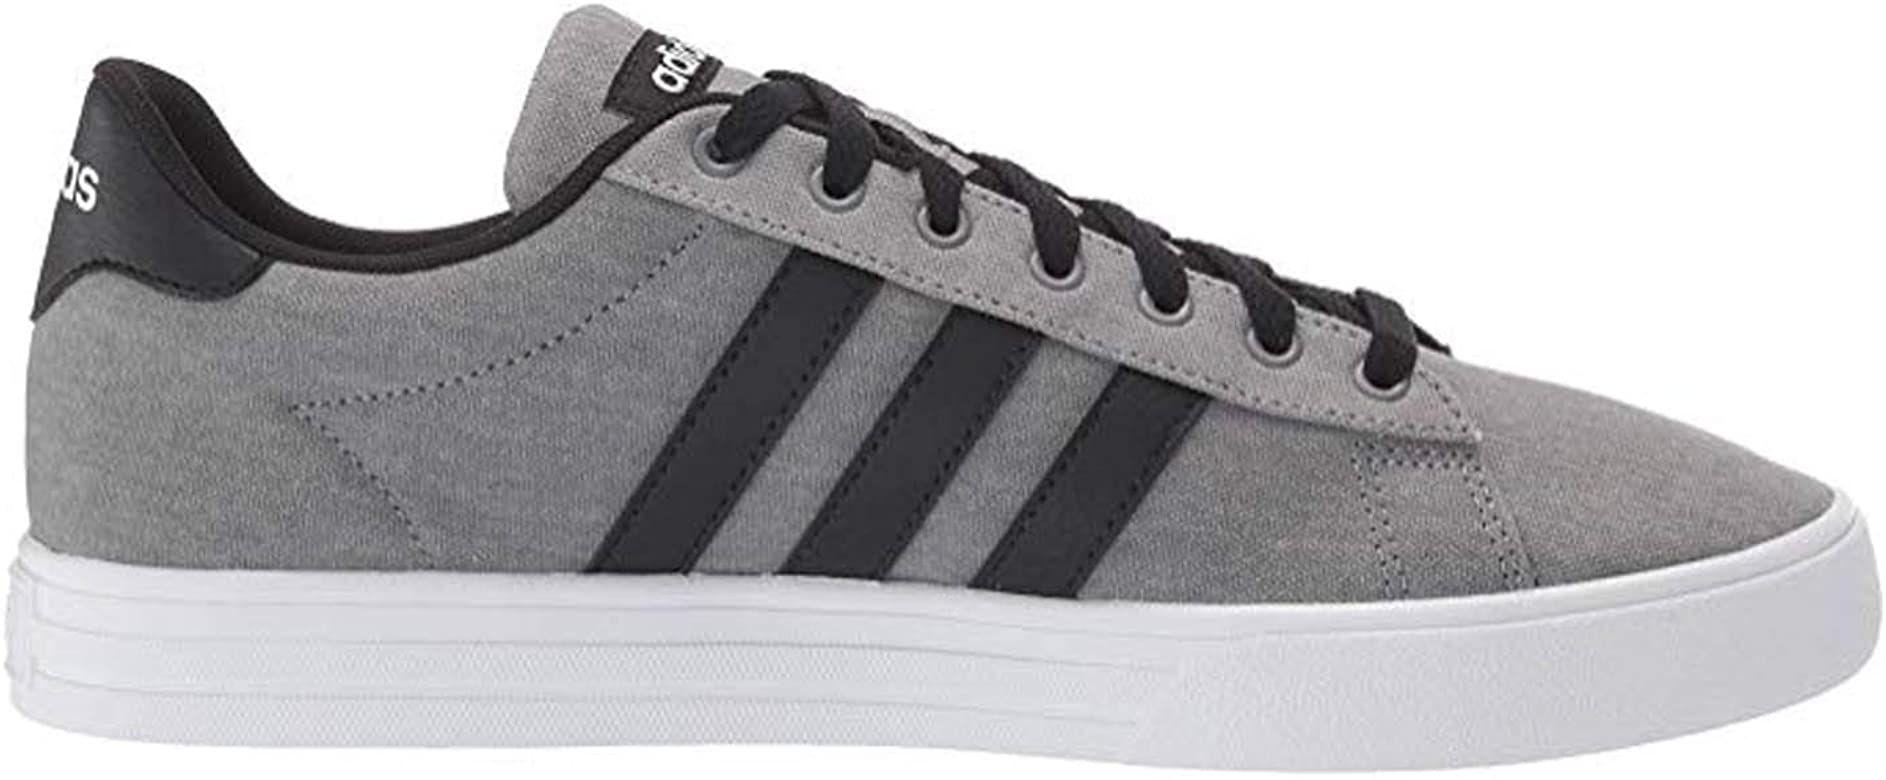 adidas Men's Daily 2.0, Grey/Black